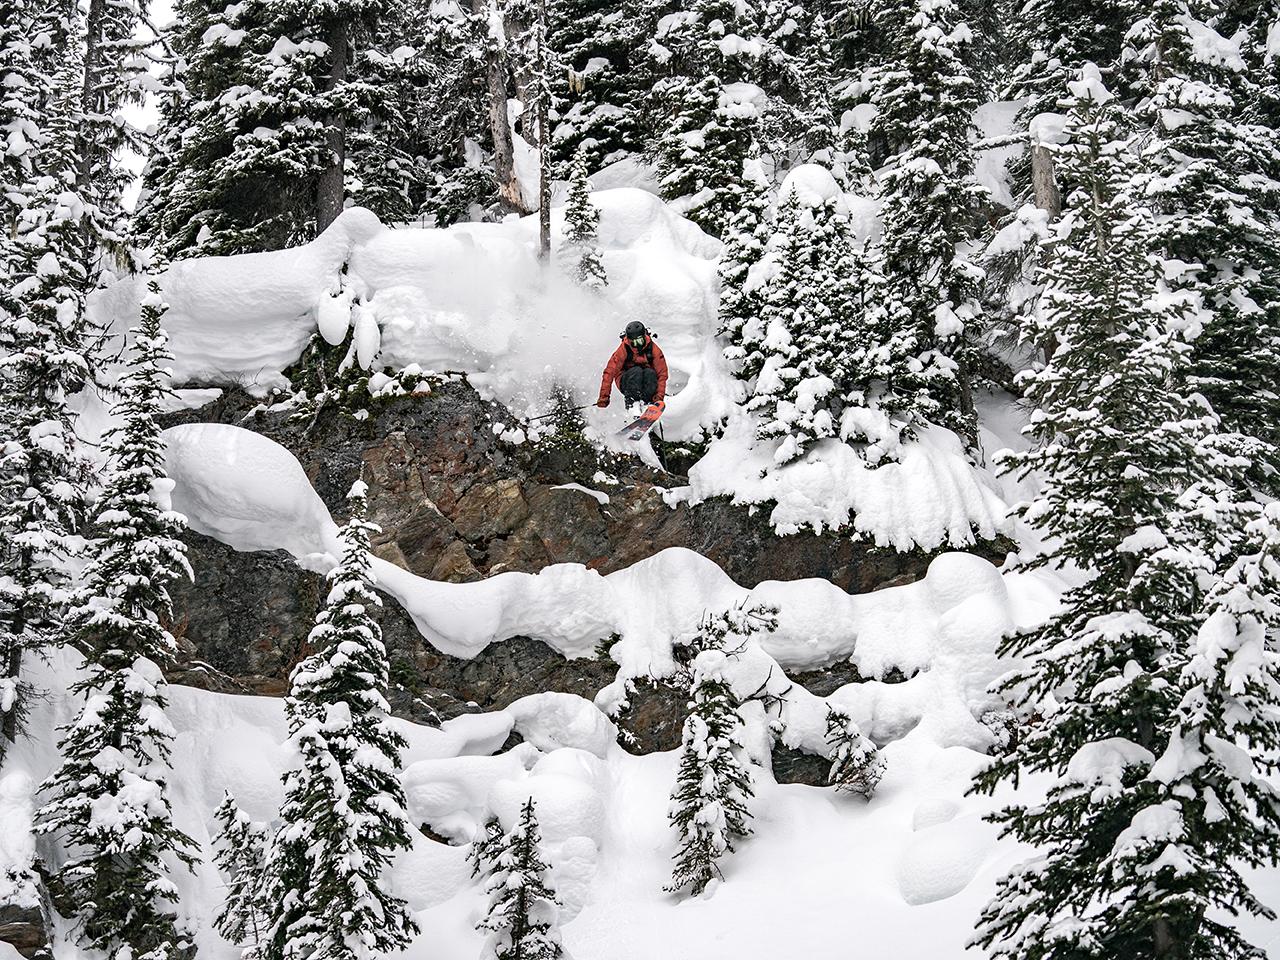 Liberty Skis Origin 112 Freeride, Backcountry, and Powder Ski